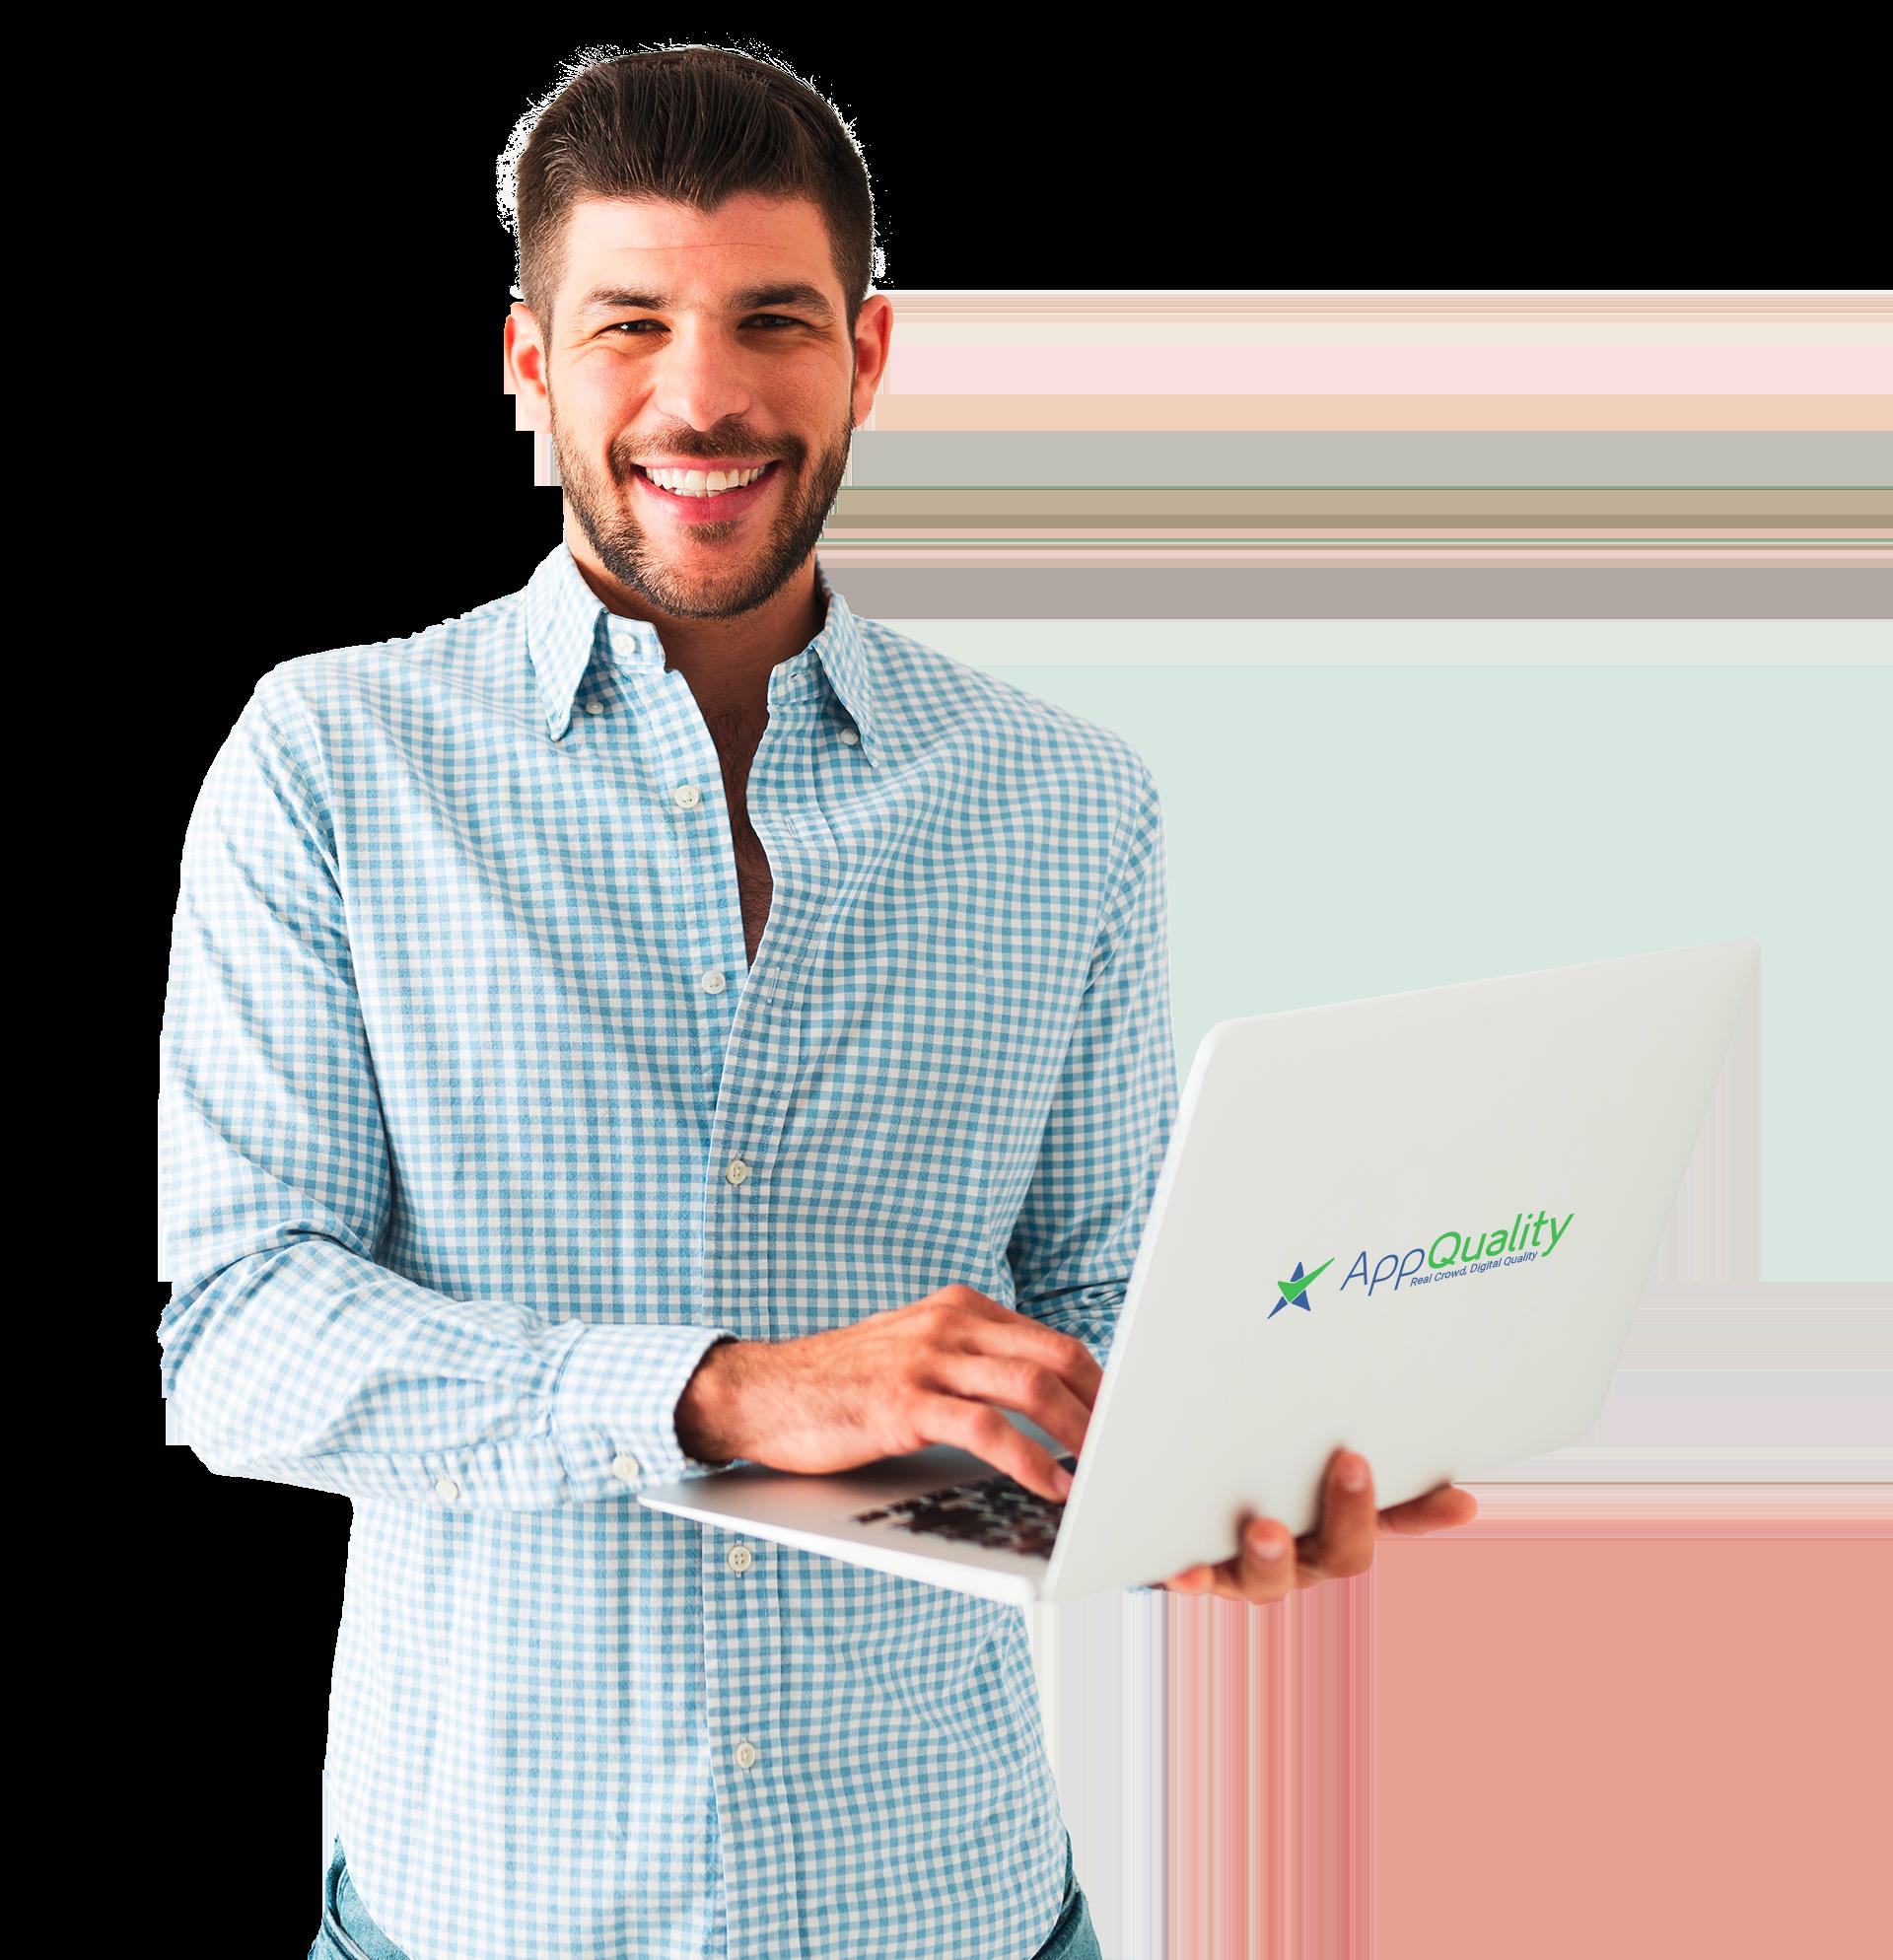 caucasian man with laptop